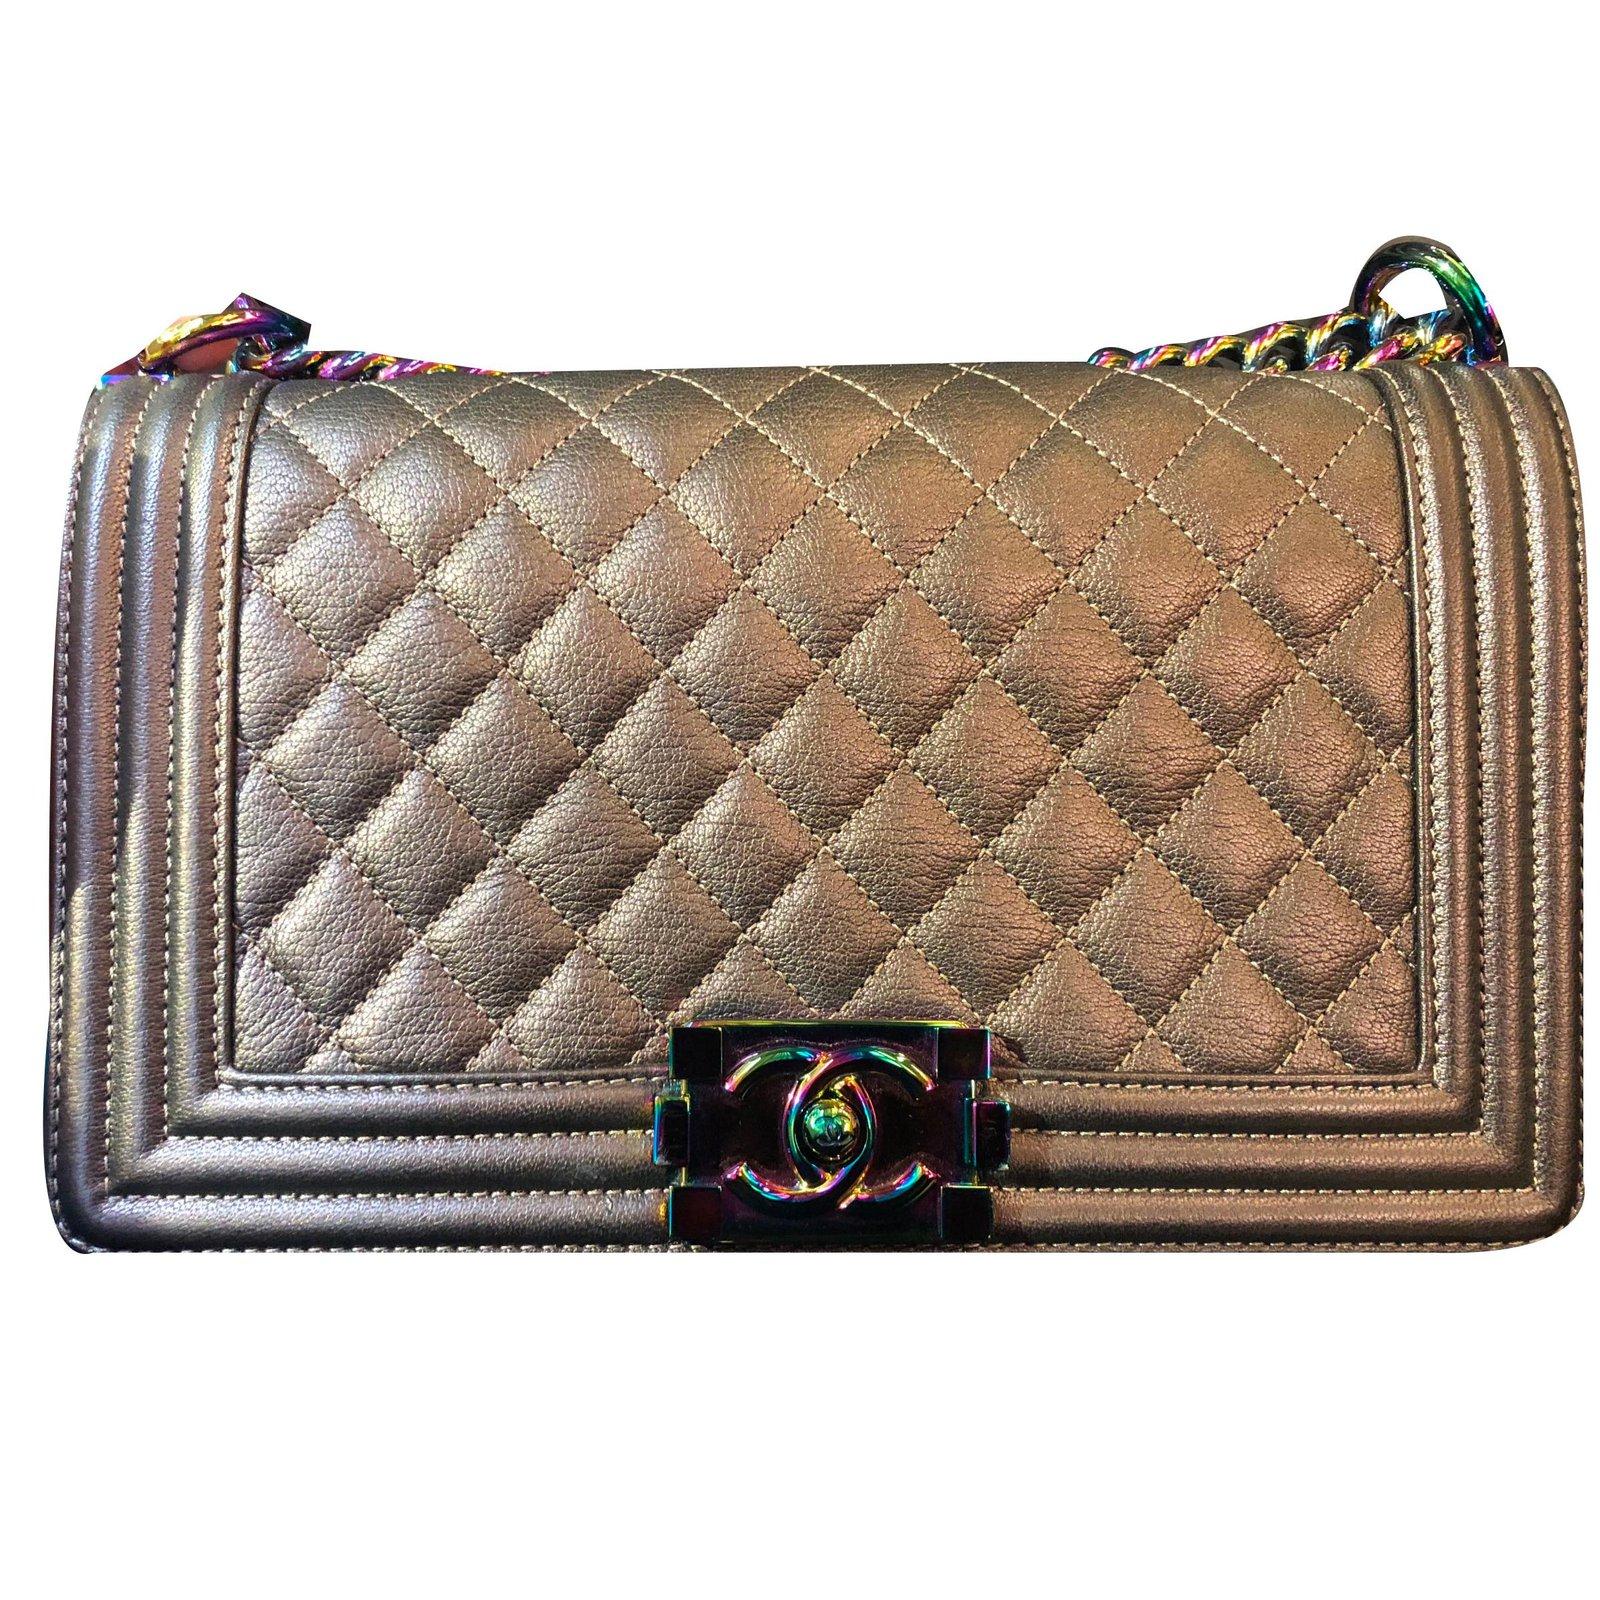 Chanel Bronze Mermaid Boy Bag In Old Medium And Rainbow Hardware Handbags Leather Ref